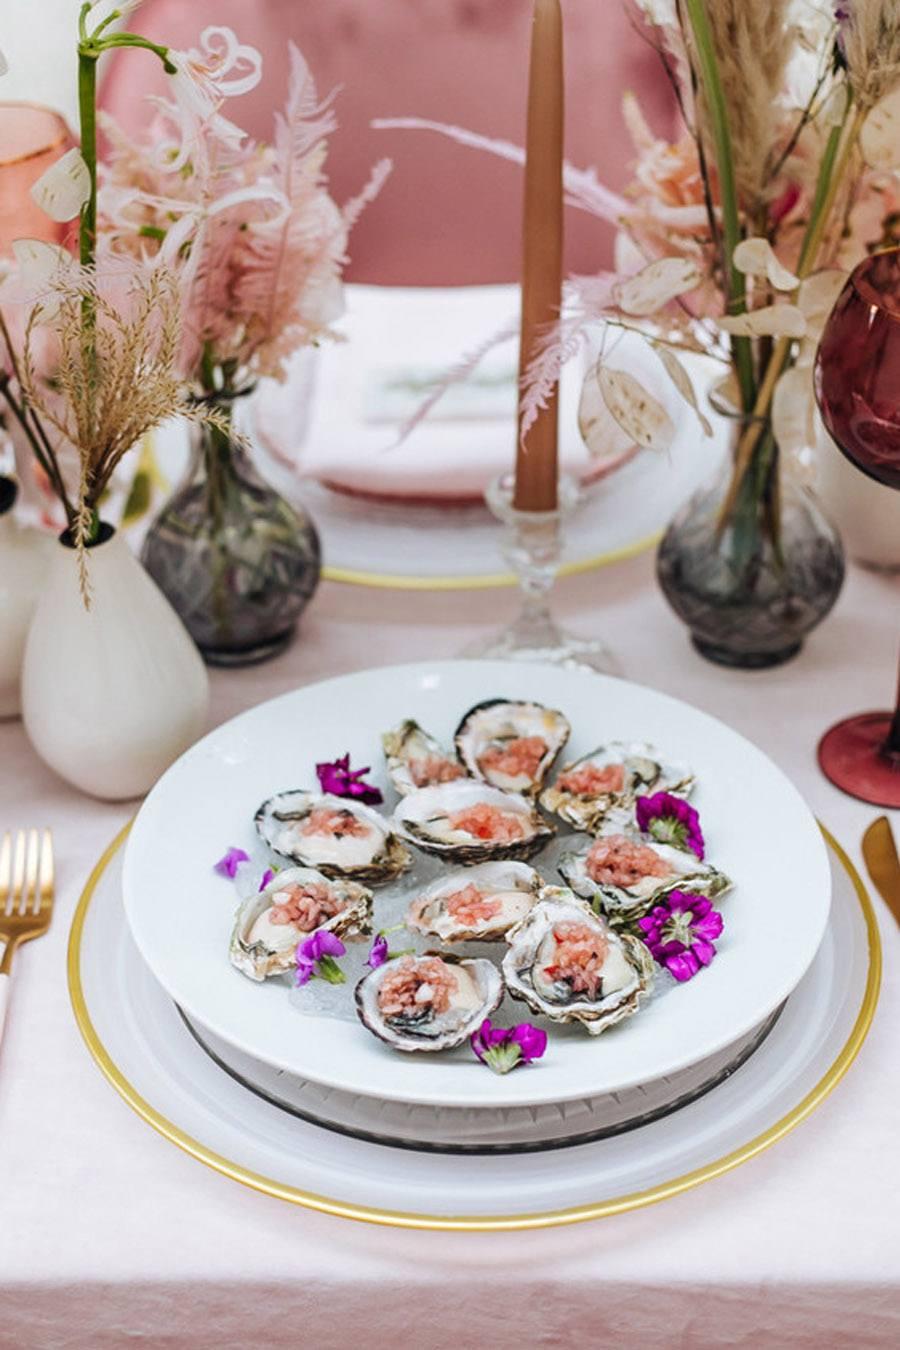 INSPIRACIÓN: TODO AL ROSA decoracion-mesa-rosa